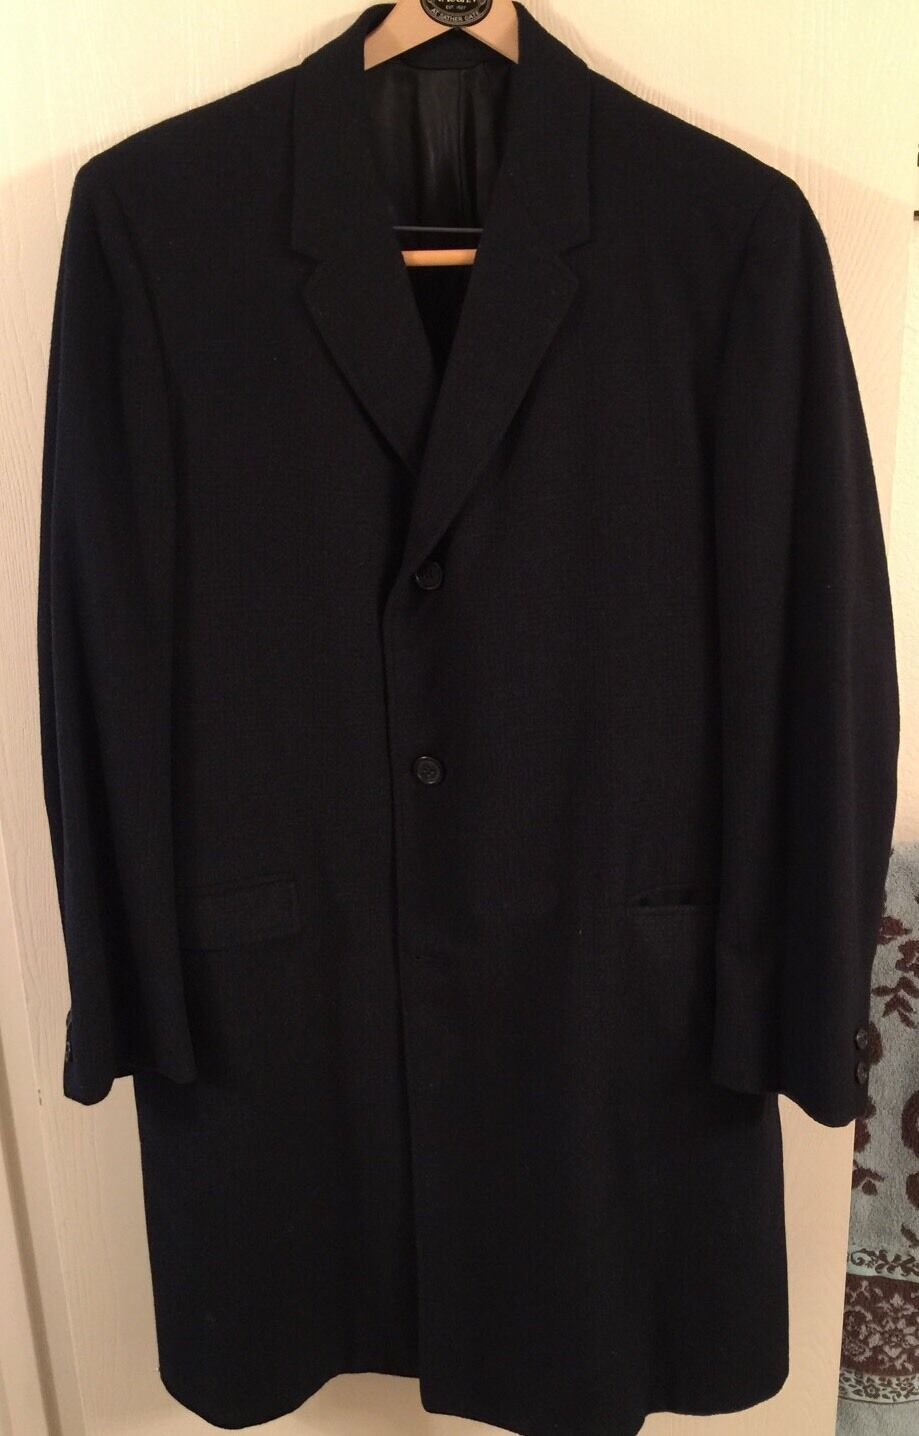 Roos Atkins Edw. Hawk Coat Size 40